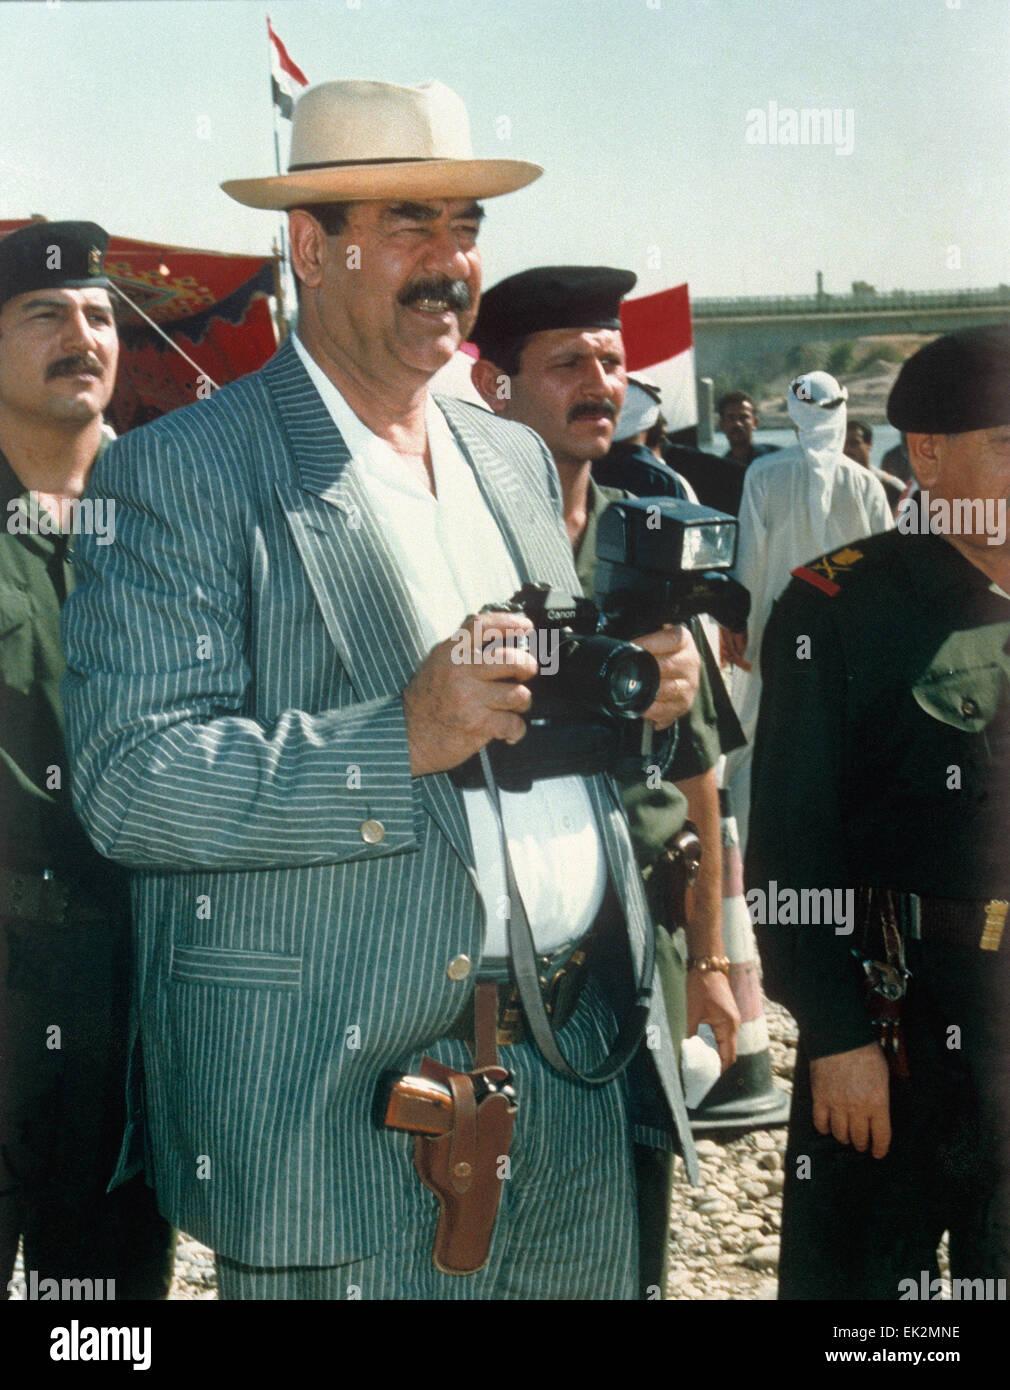 iraq iraqi president saddam hussein with camera